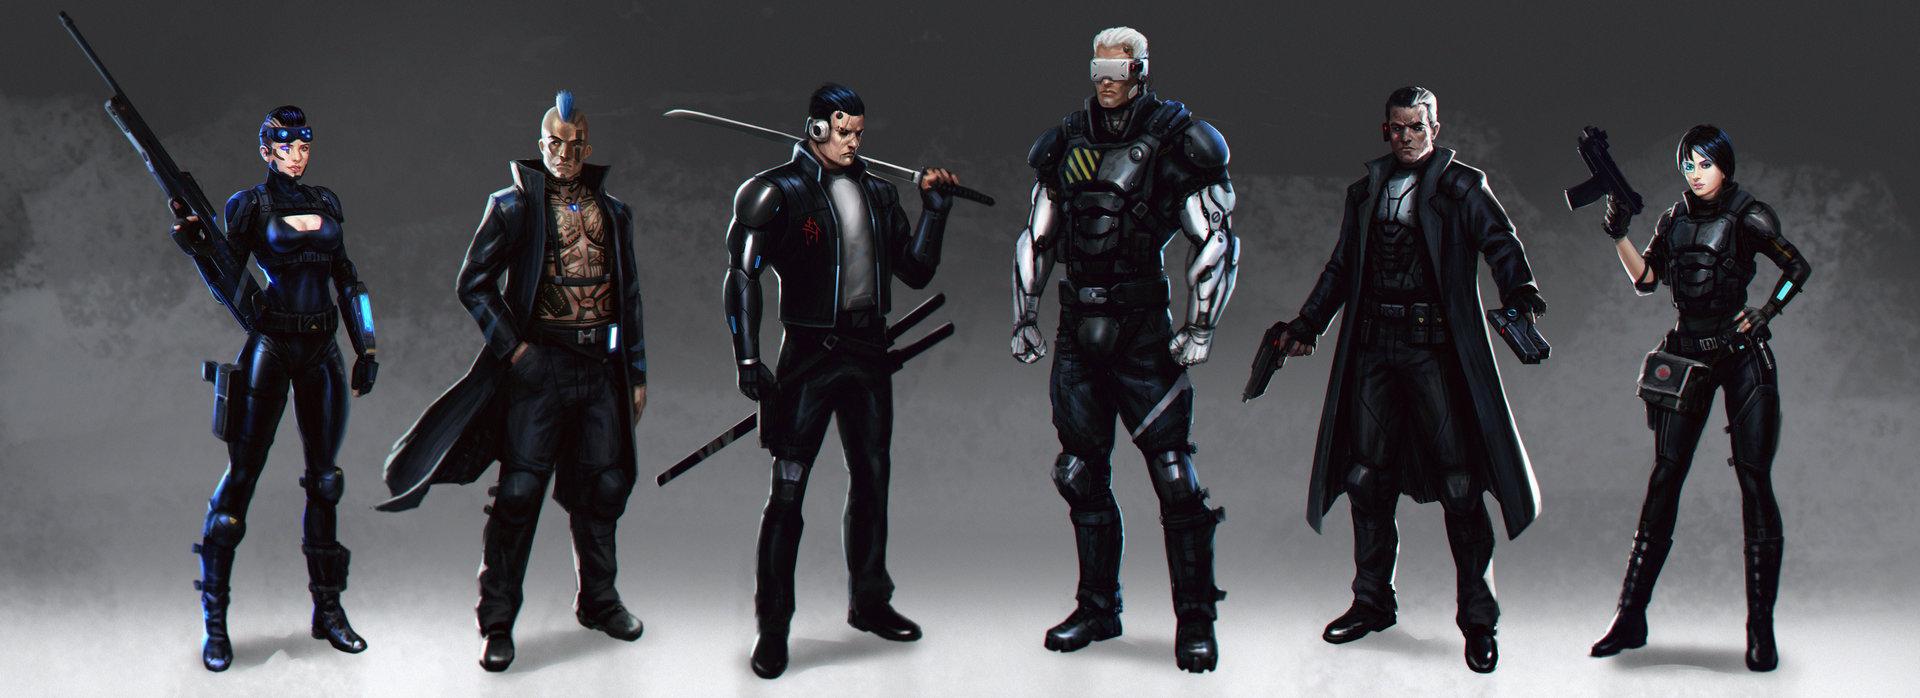 Salvador trakal characterstest2